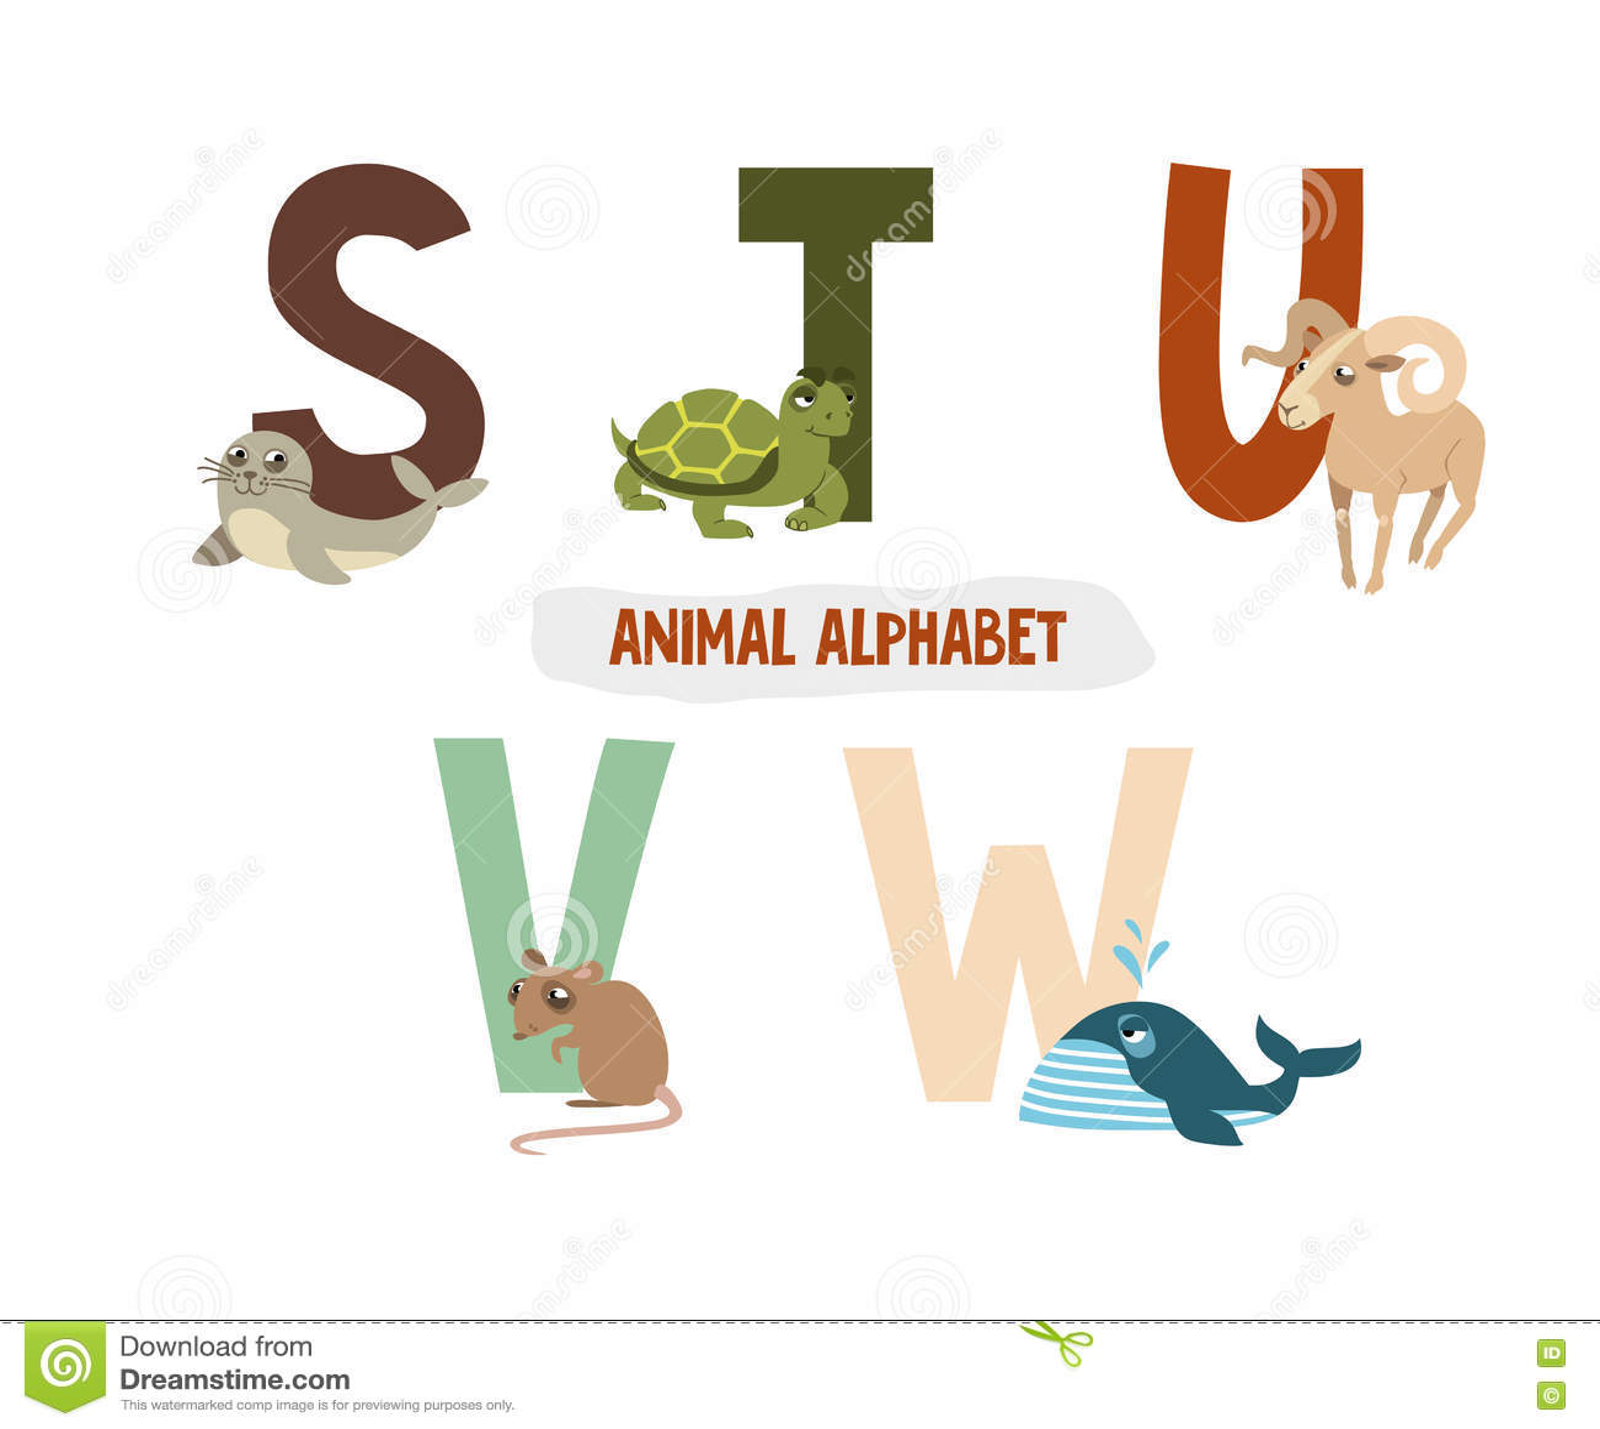 animal alphabet u v w stock vector 151807199.html